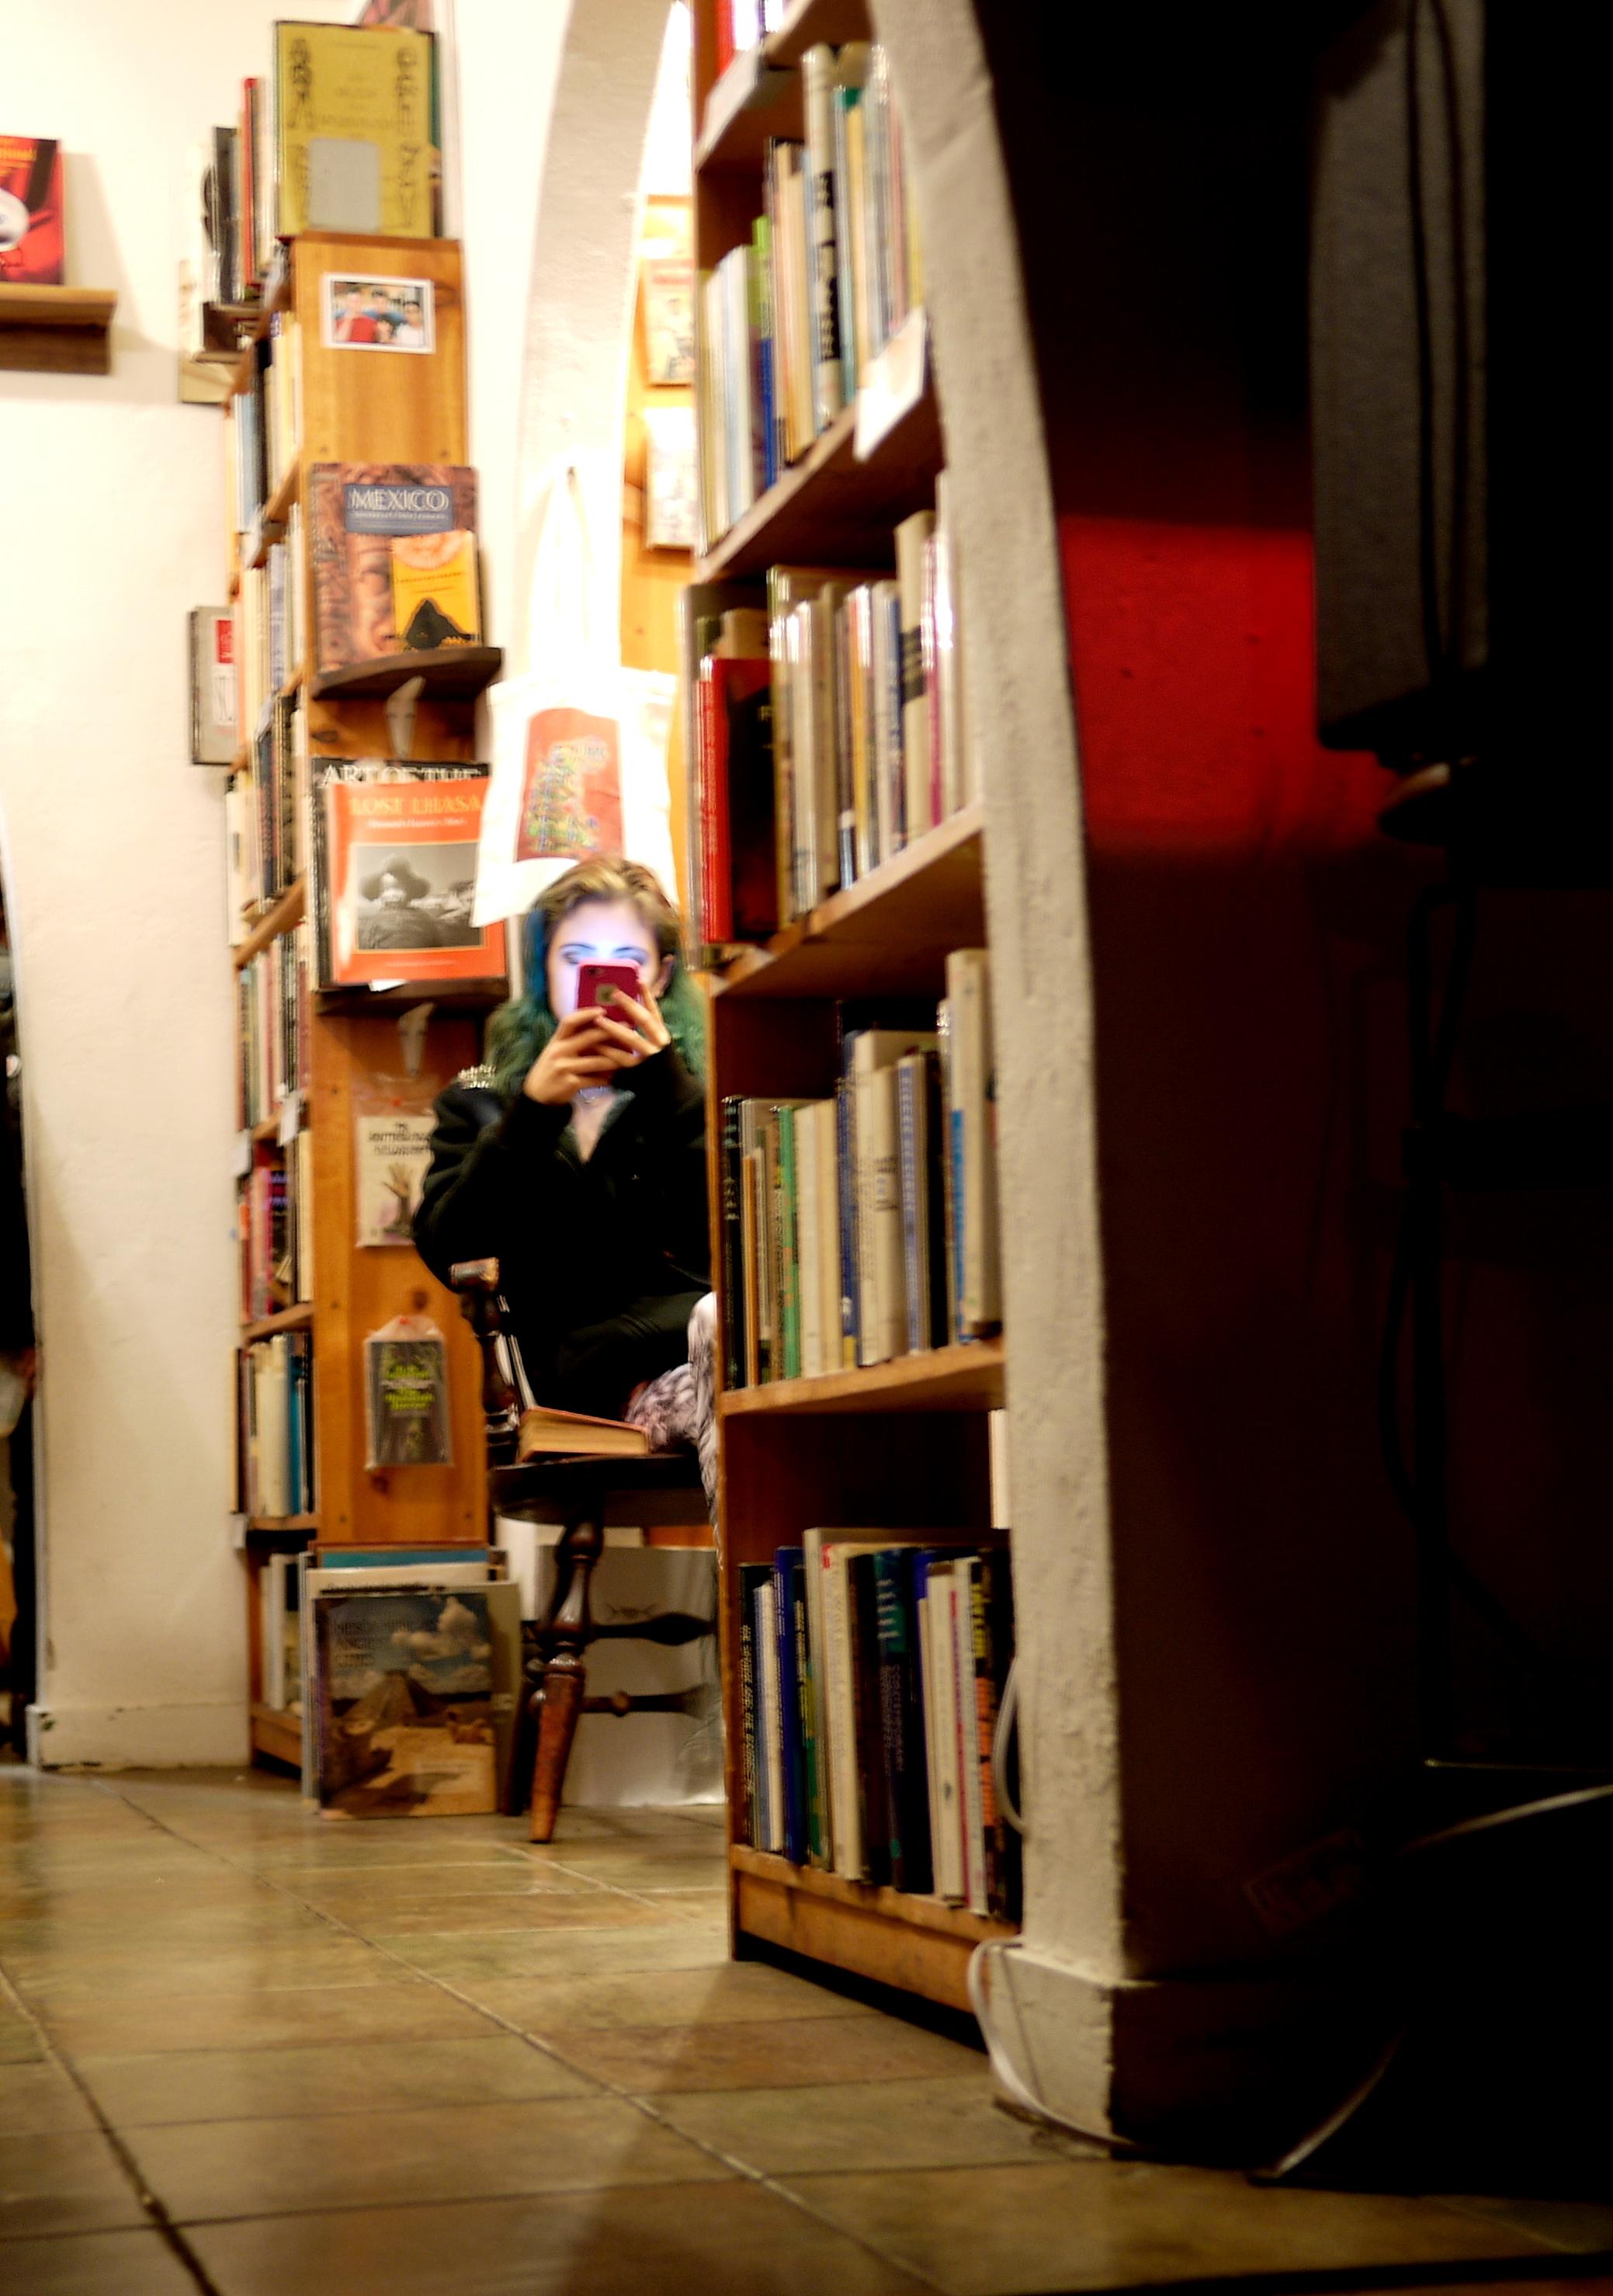 Dire Wolves Tara Jane ONeil and Samara Lubelski at Adobe Books